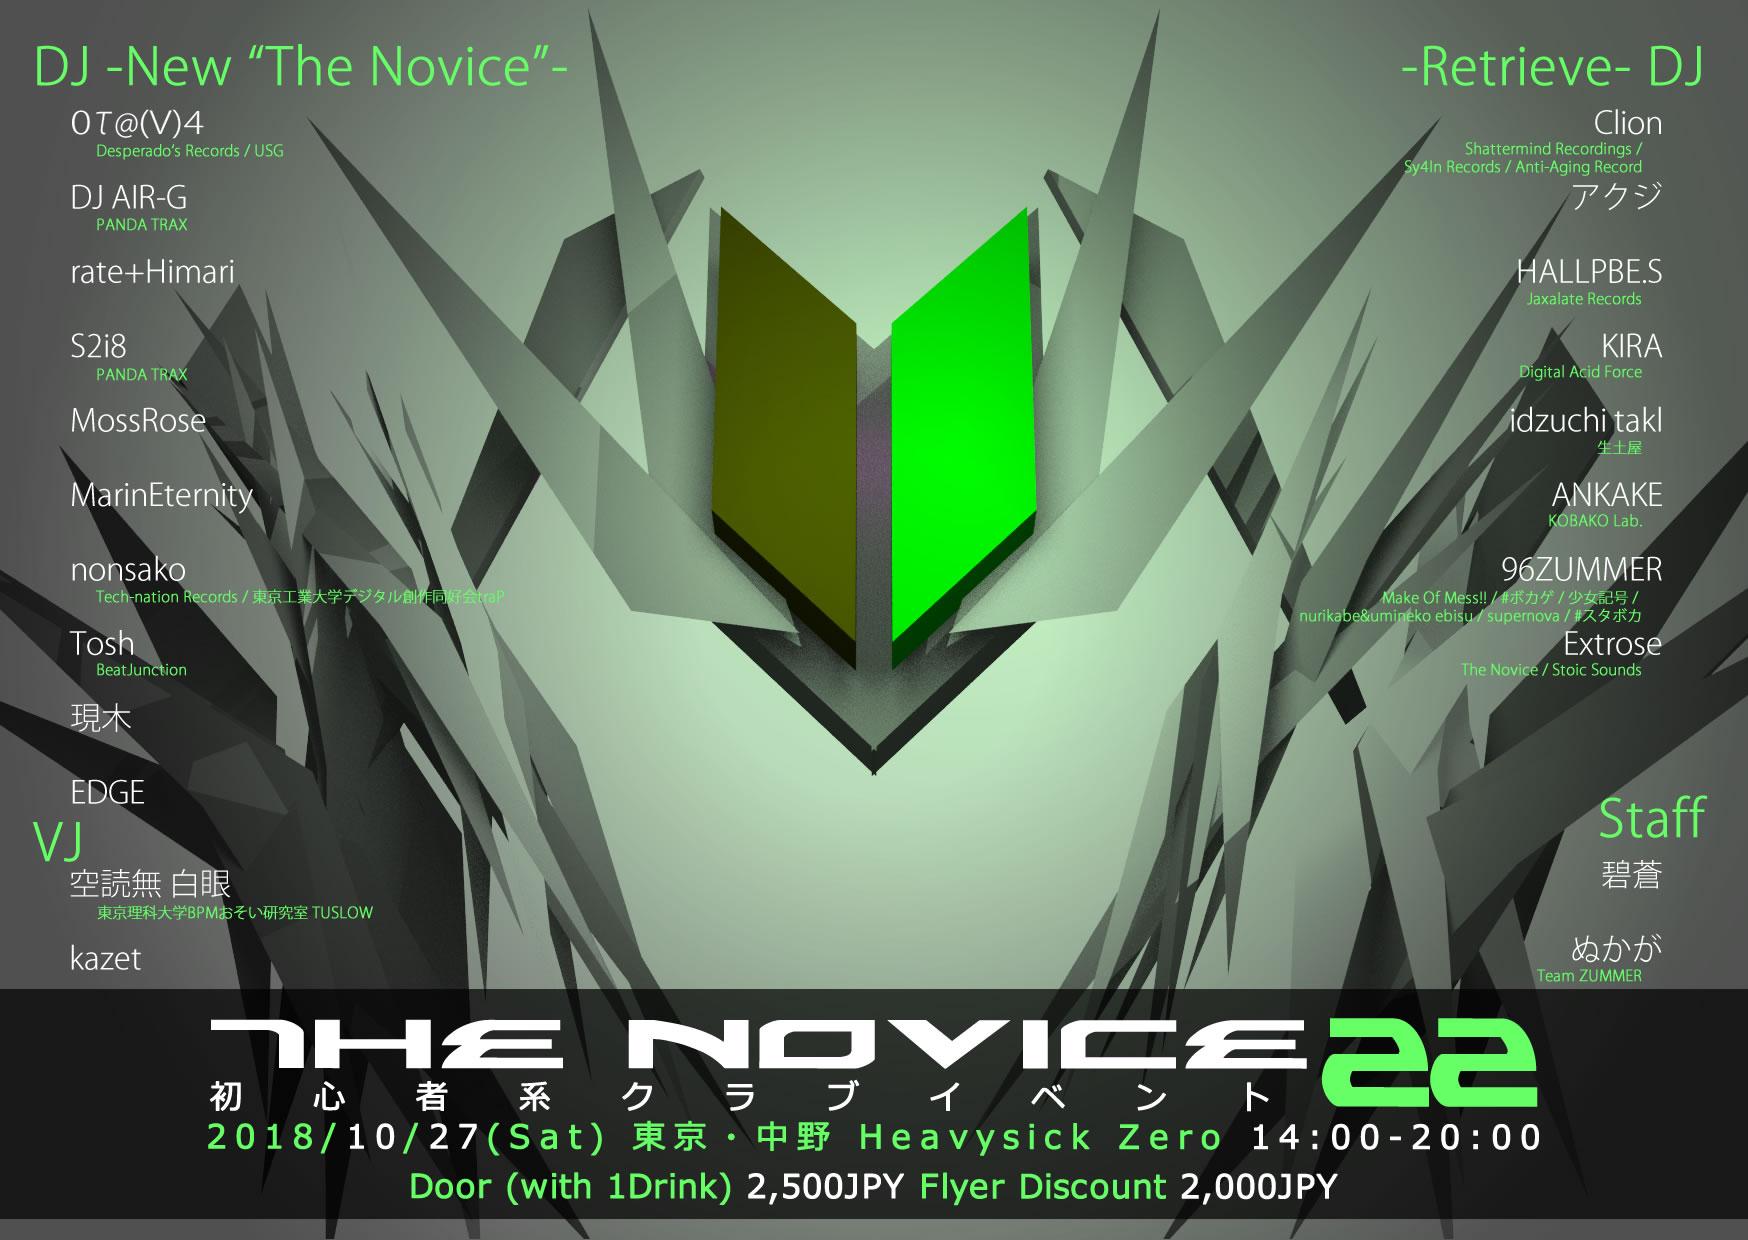 the novice 22 heavysick zero